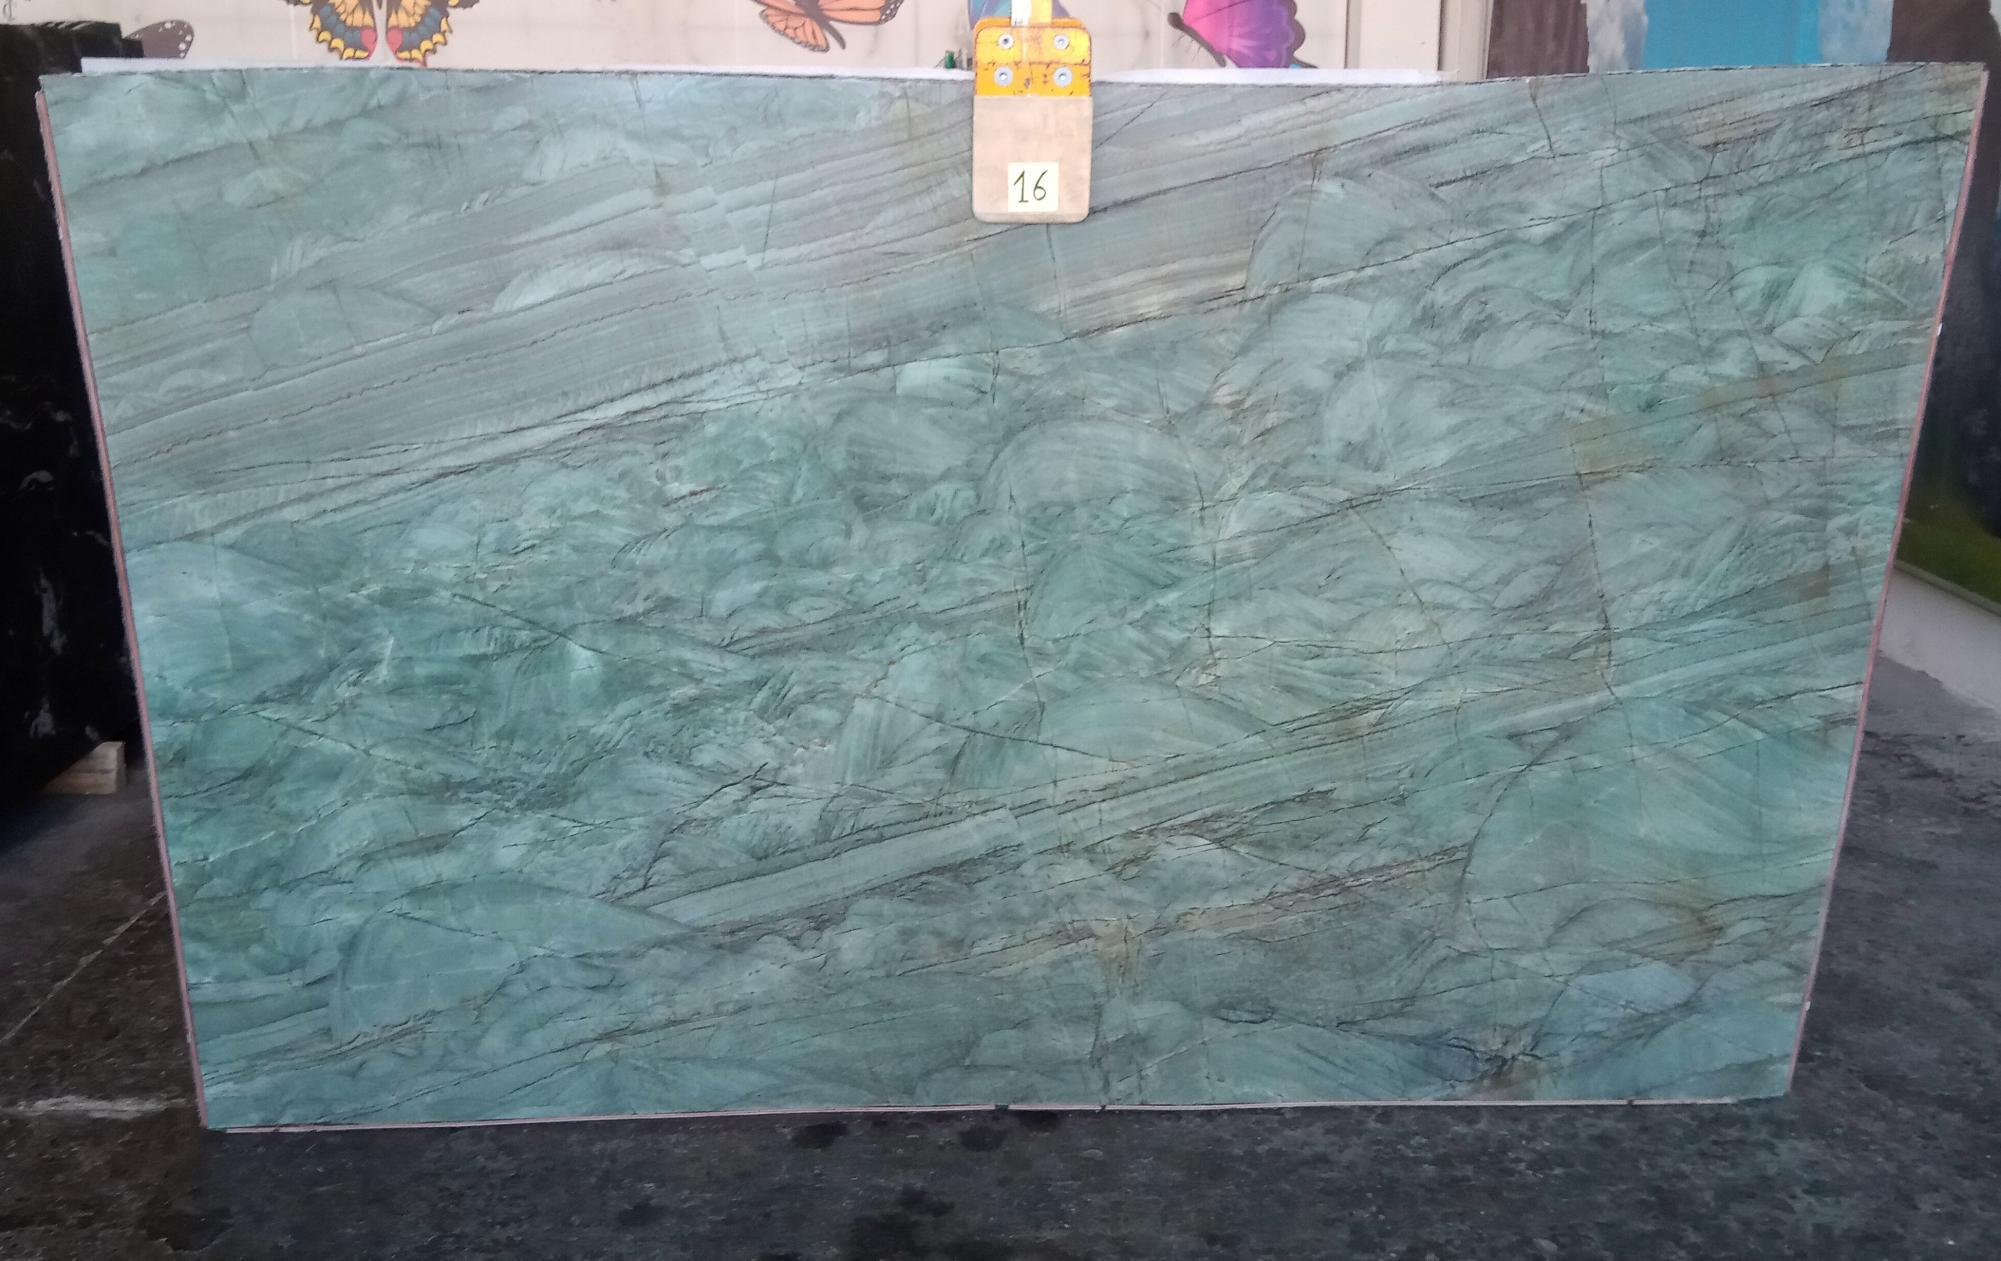 EMERALD GREEN Supply Veneto (Italy) polished slabs Z0209 , Slab #16 natural quartzite